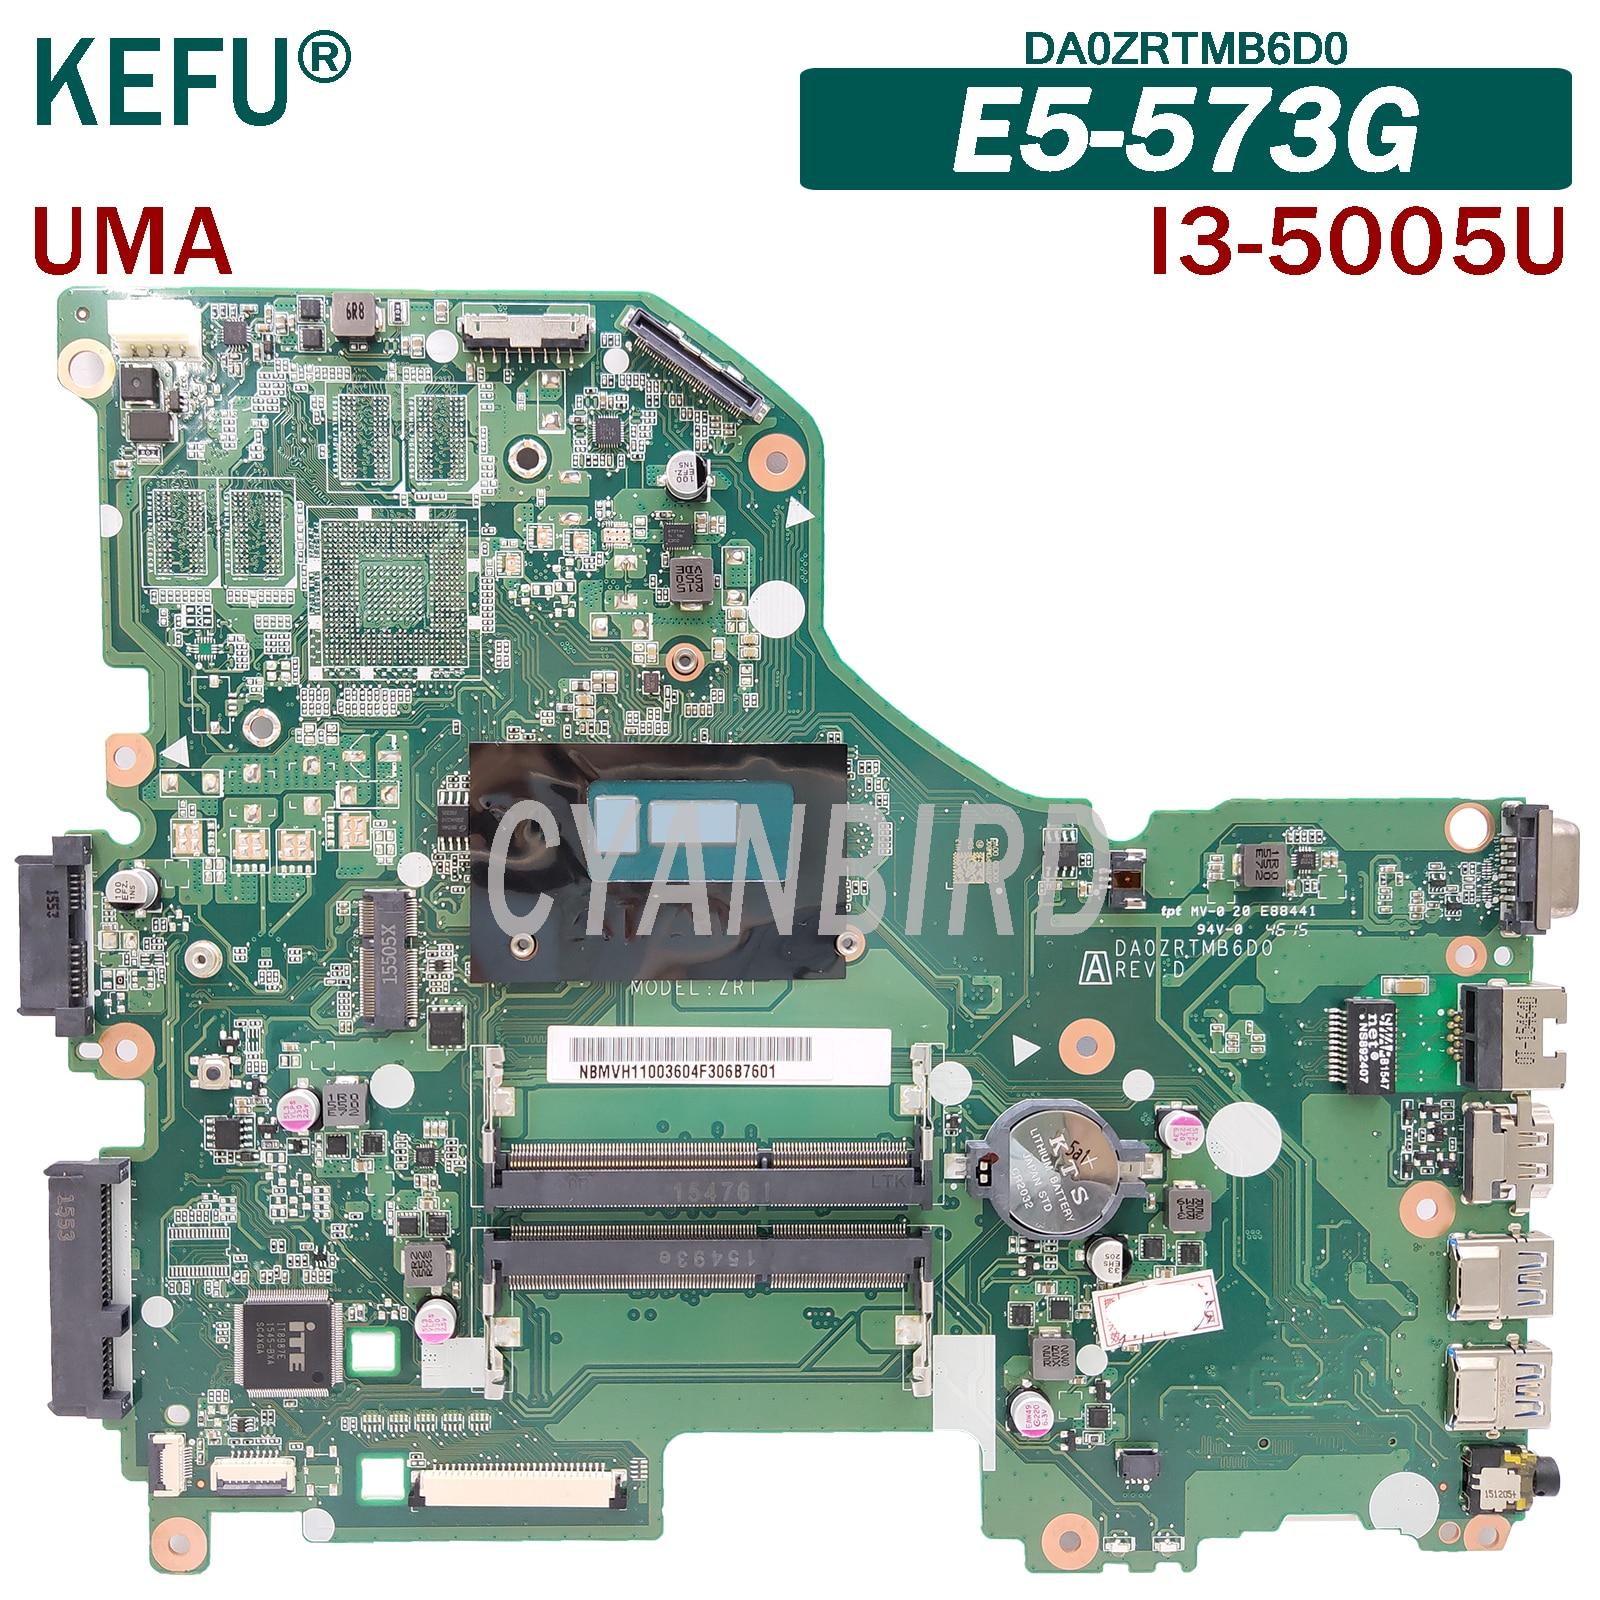 KEFU DA0ZRTMB6D0 اللوحة الرئيسية الأصلية لشركة أيسر E5-573G UMA مع I3-5005U اللوحة الأم للكمبيوتر المحمول